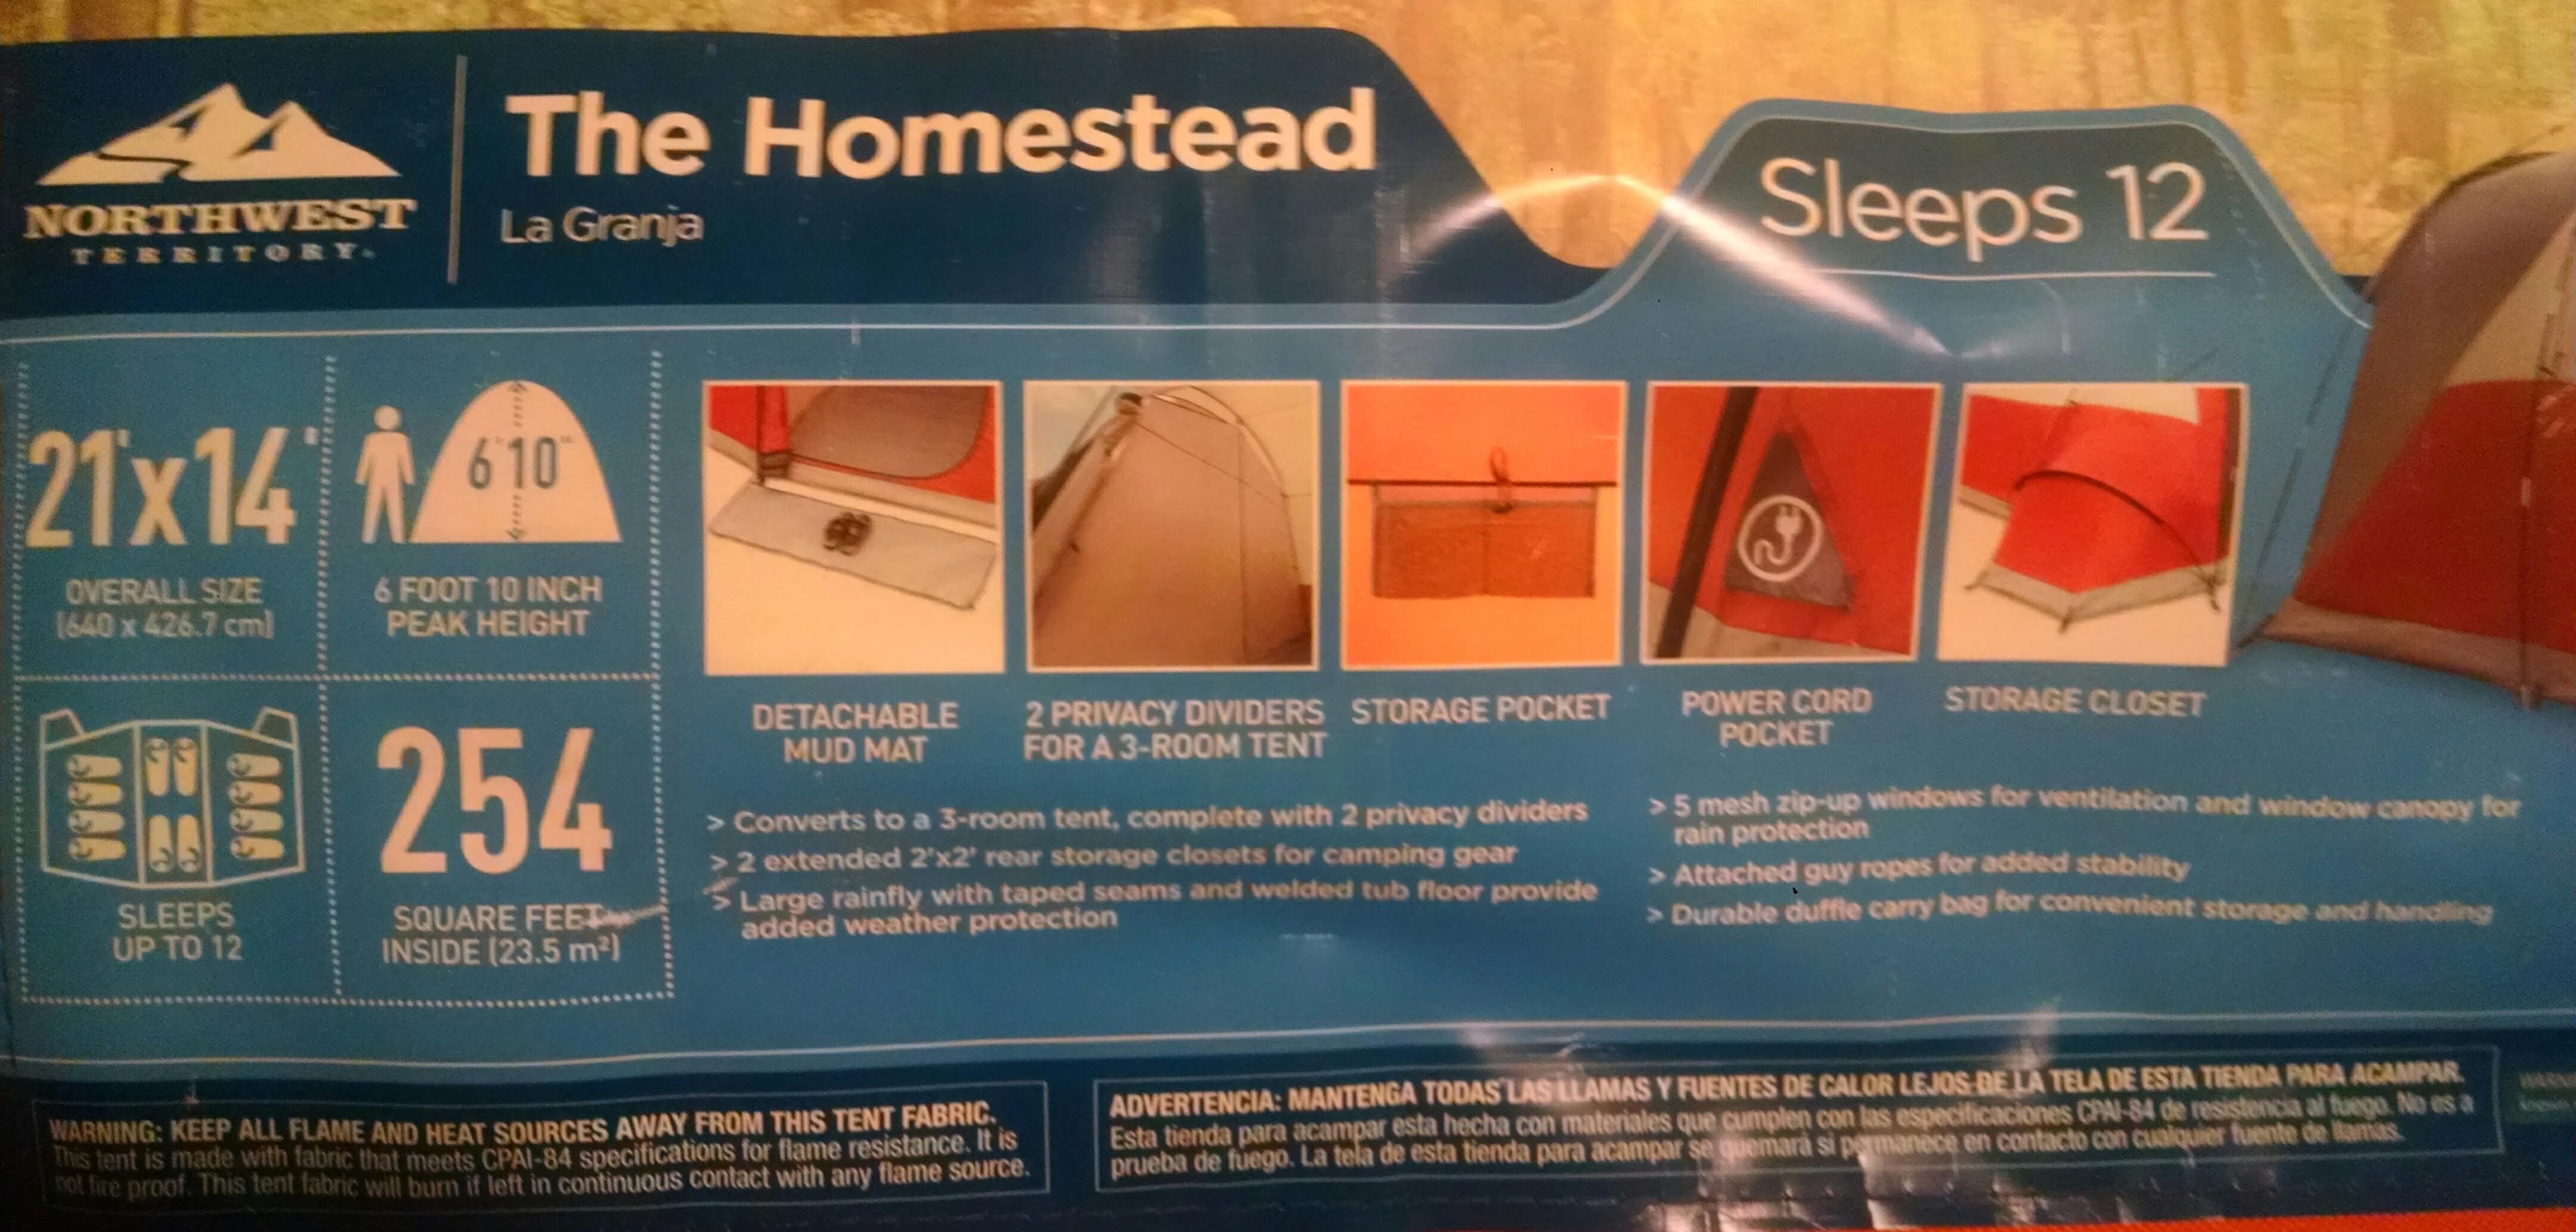 Loanables Northwest Territory Homestead Tent Sleeps 12